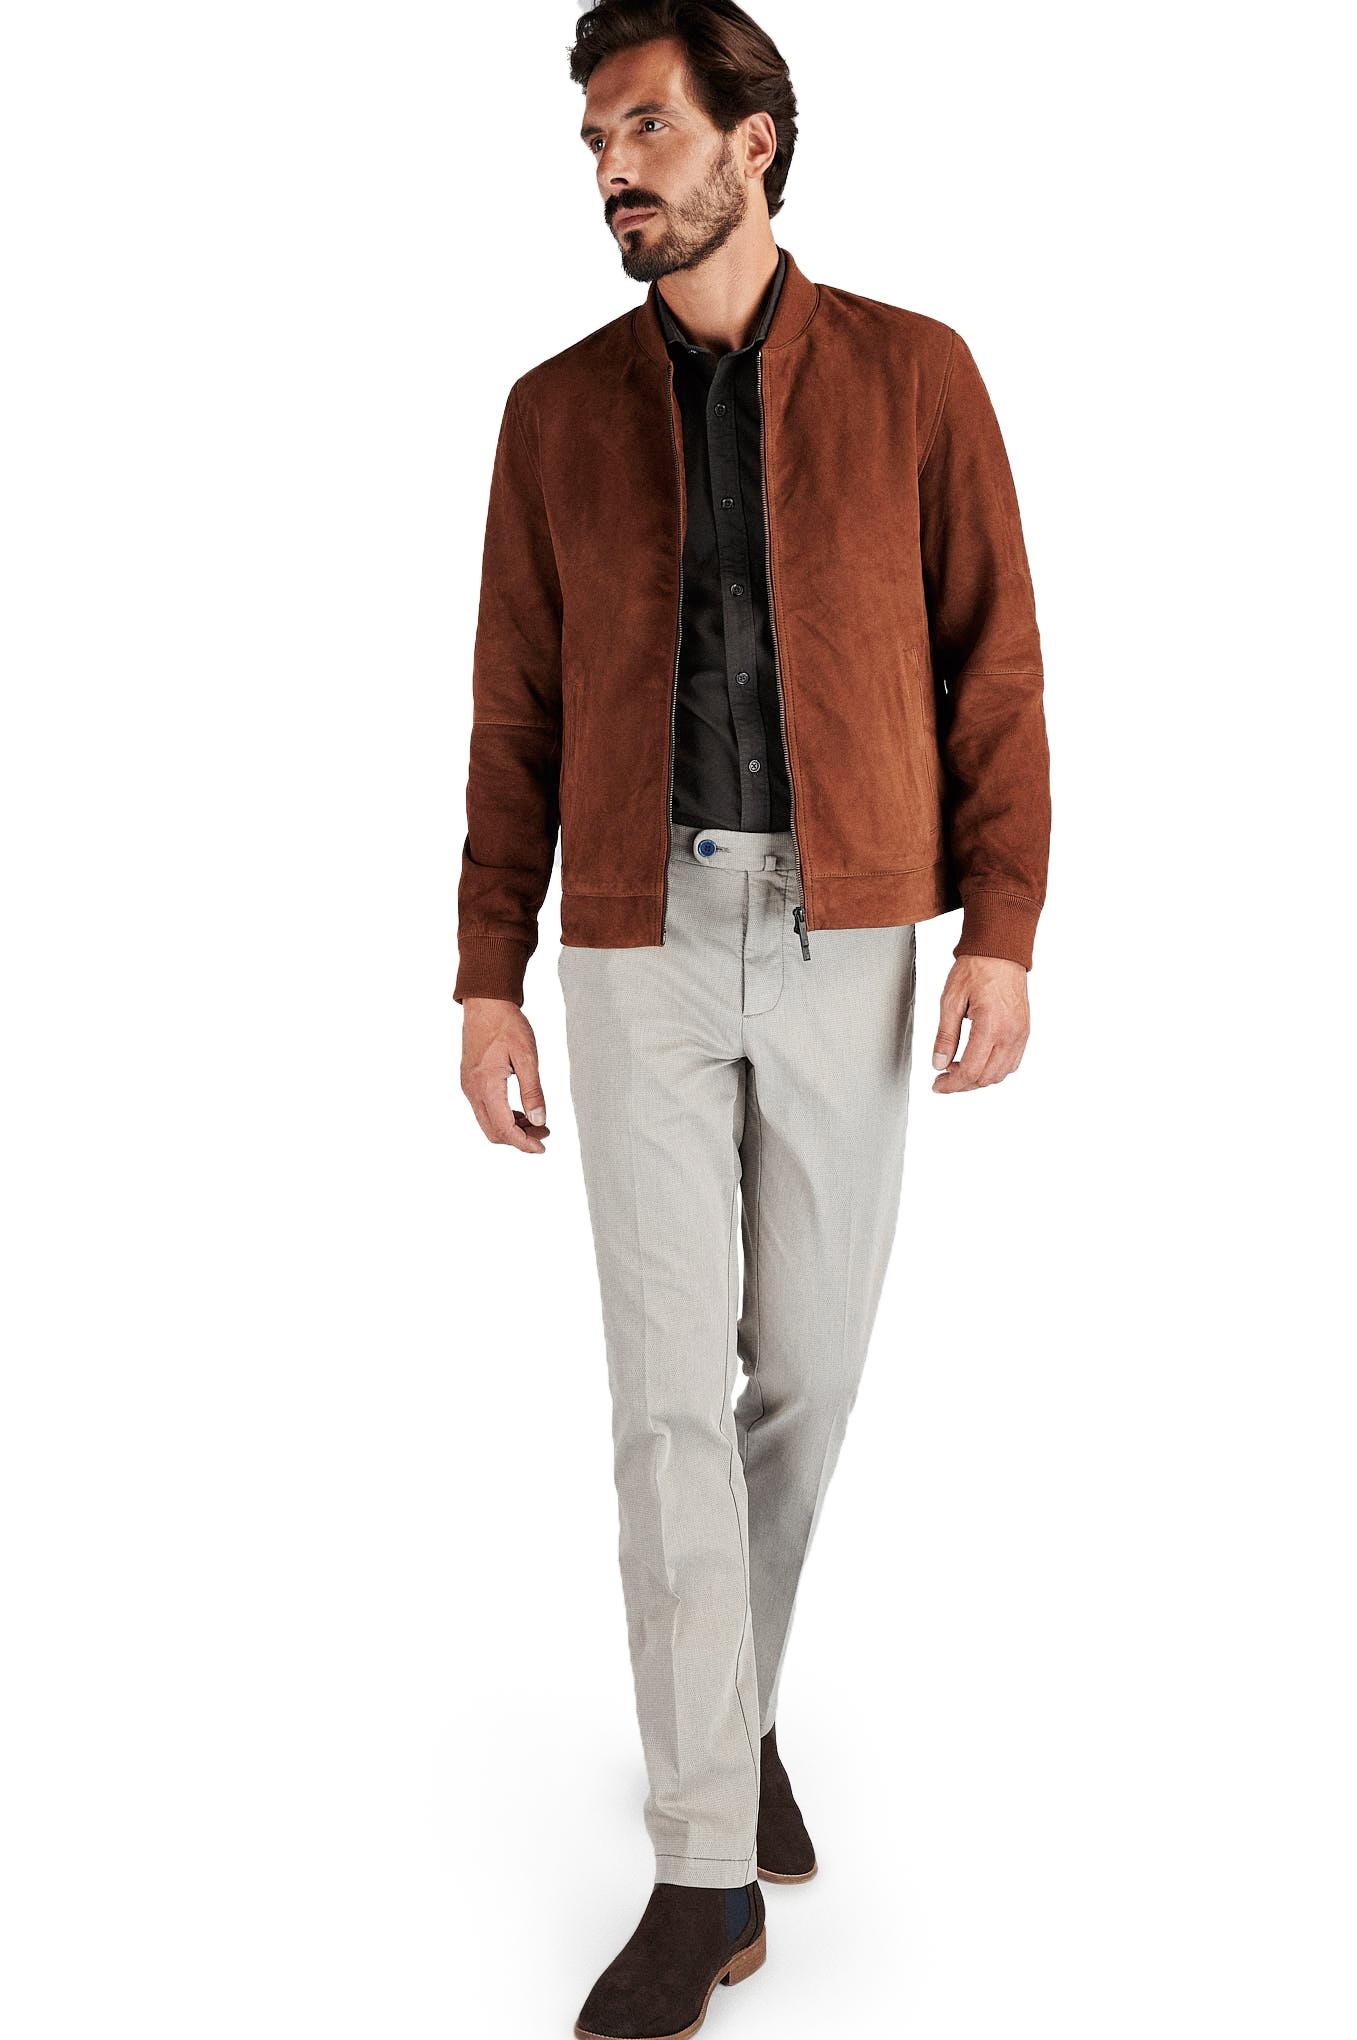 Leather Jacket Caramel Casual Man